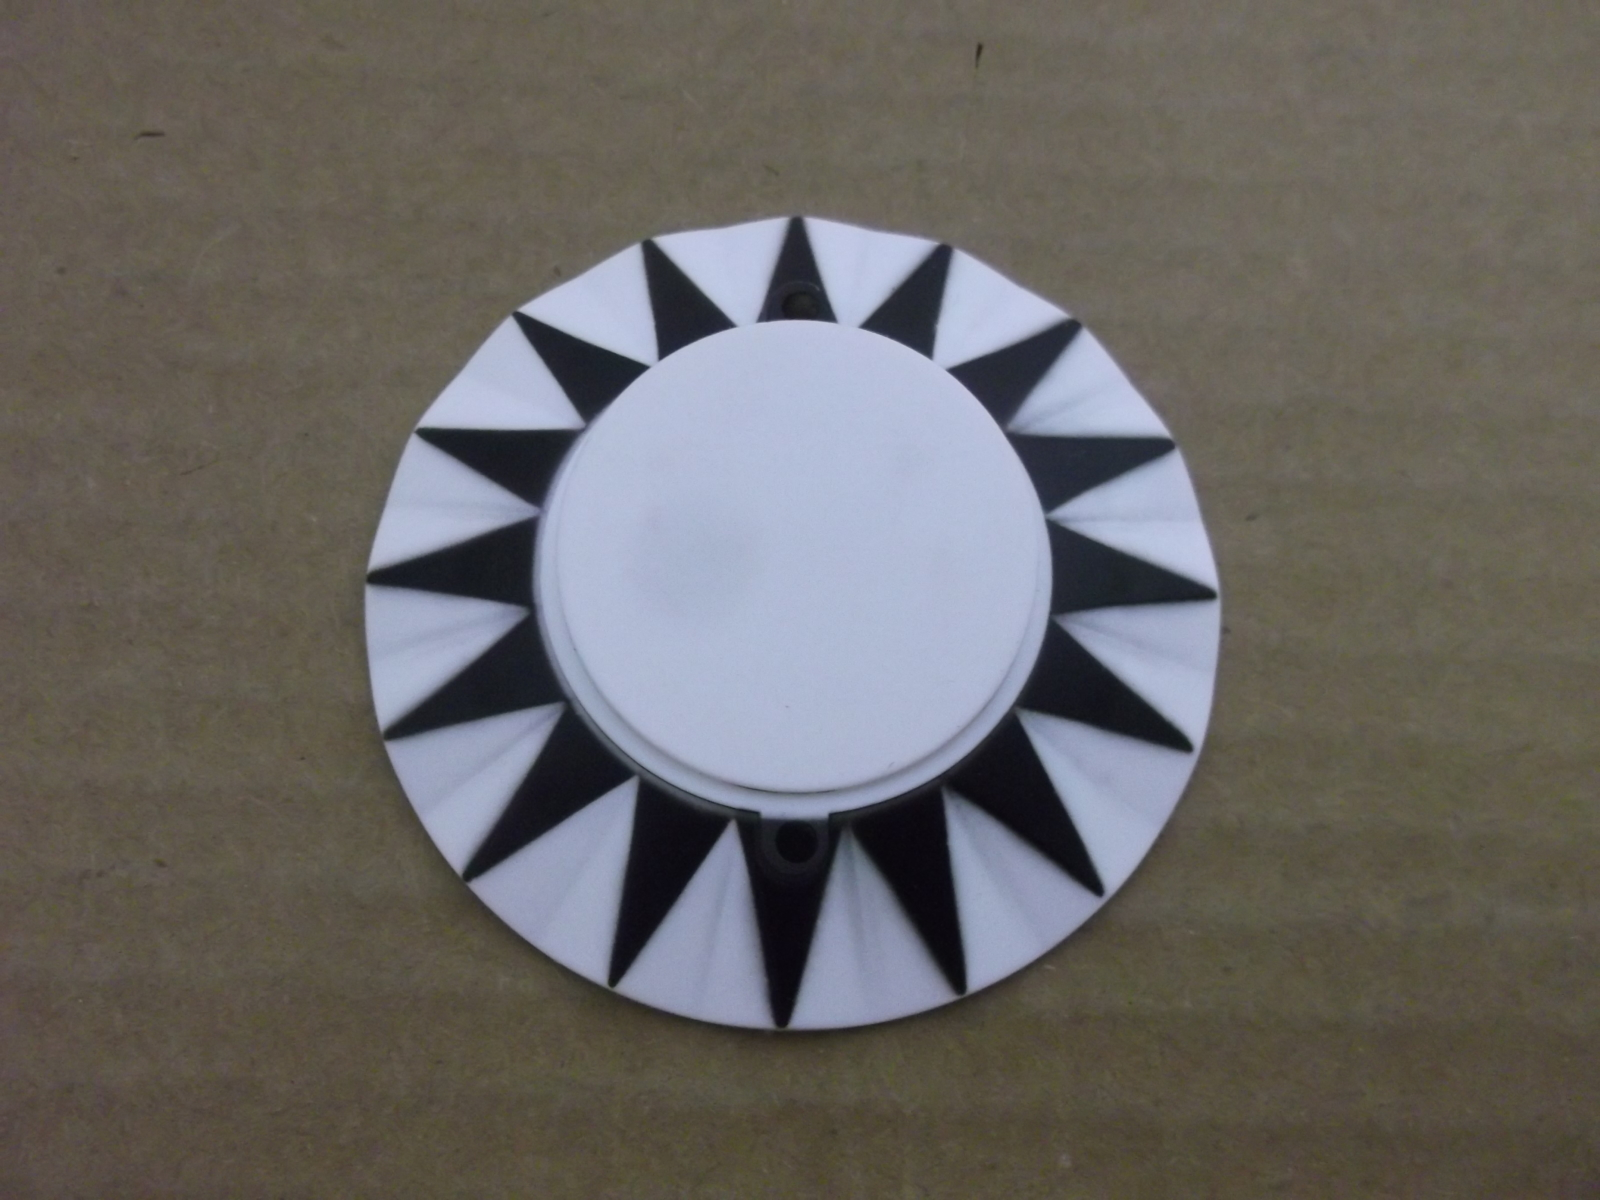 Bally space invaders Pinball Machine POP BUMPER CAP SET